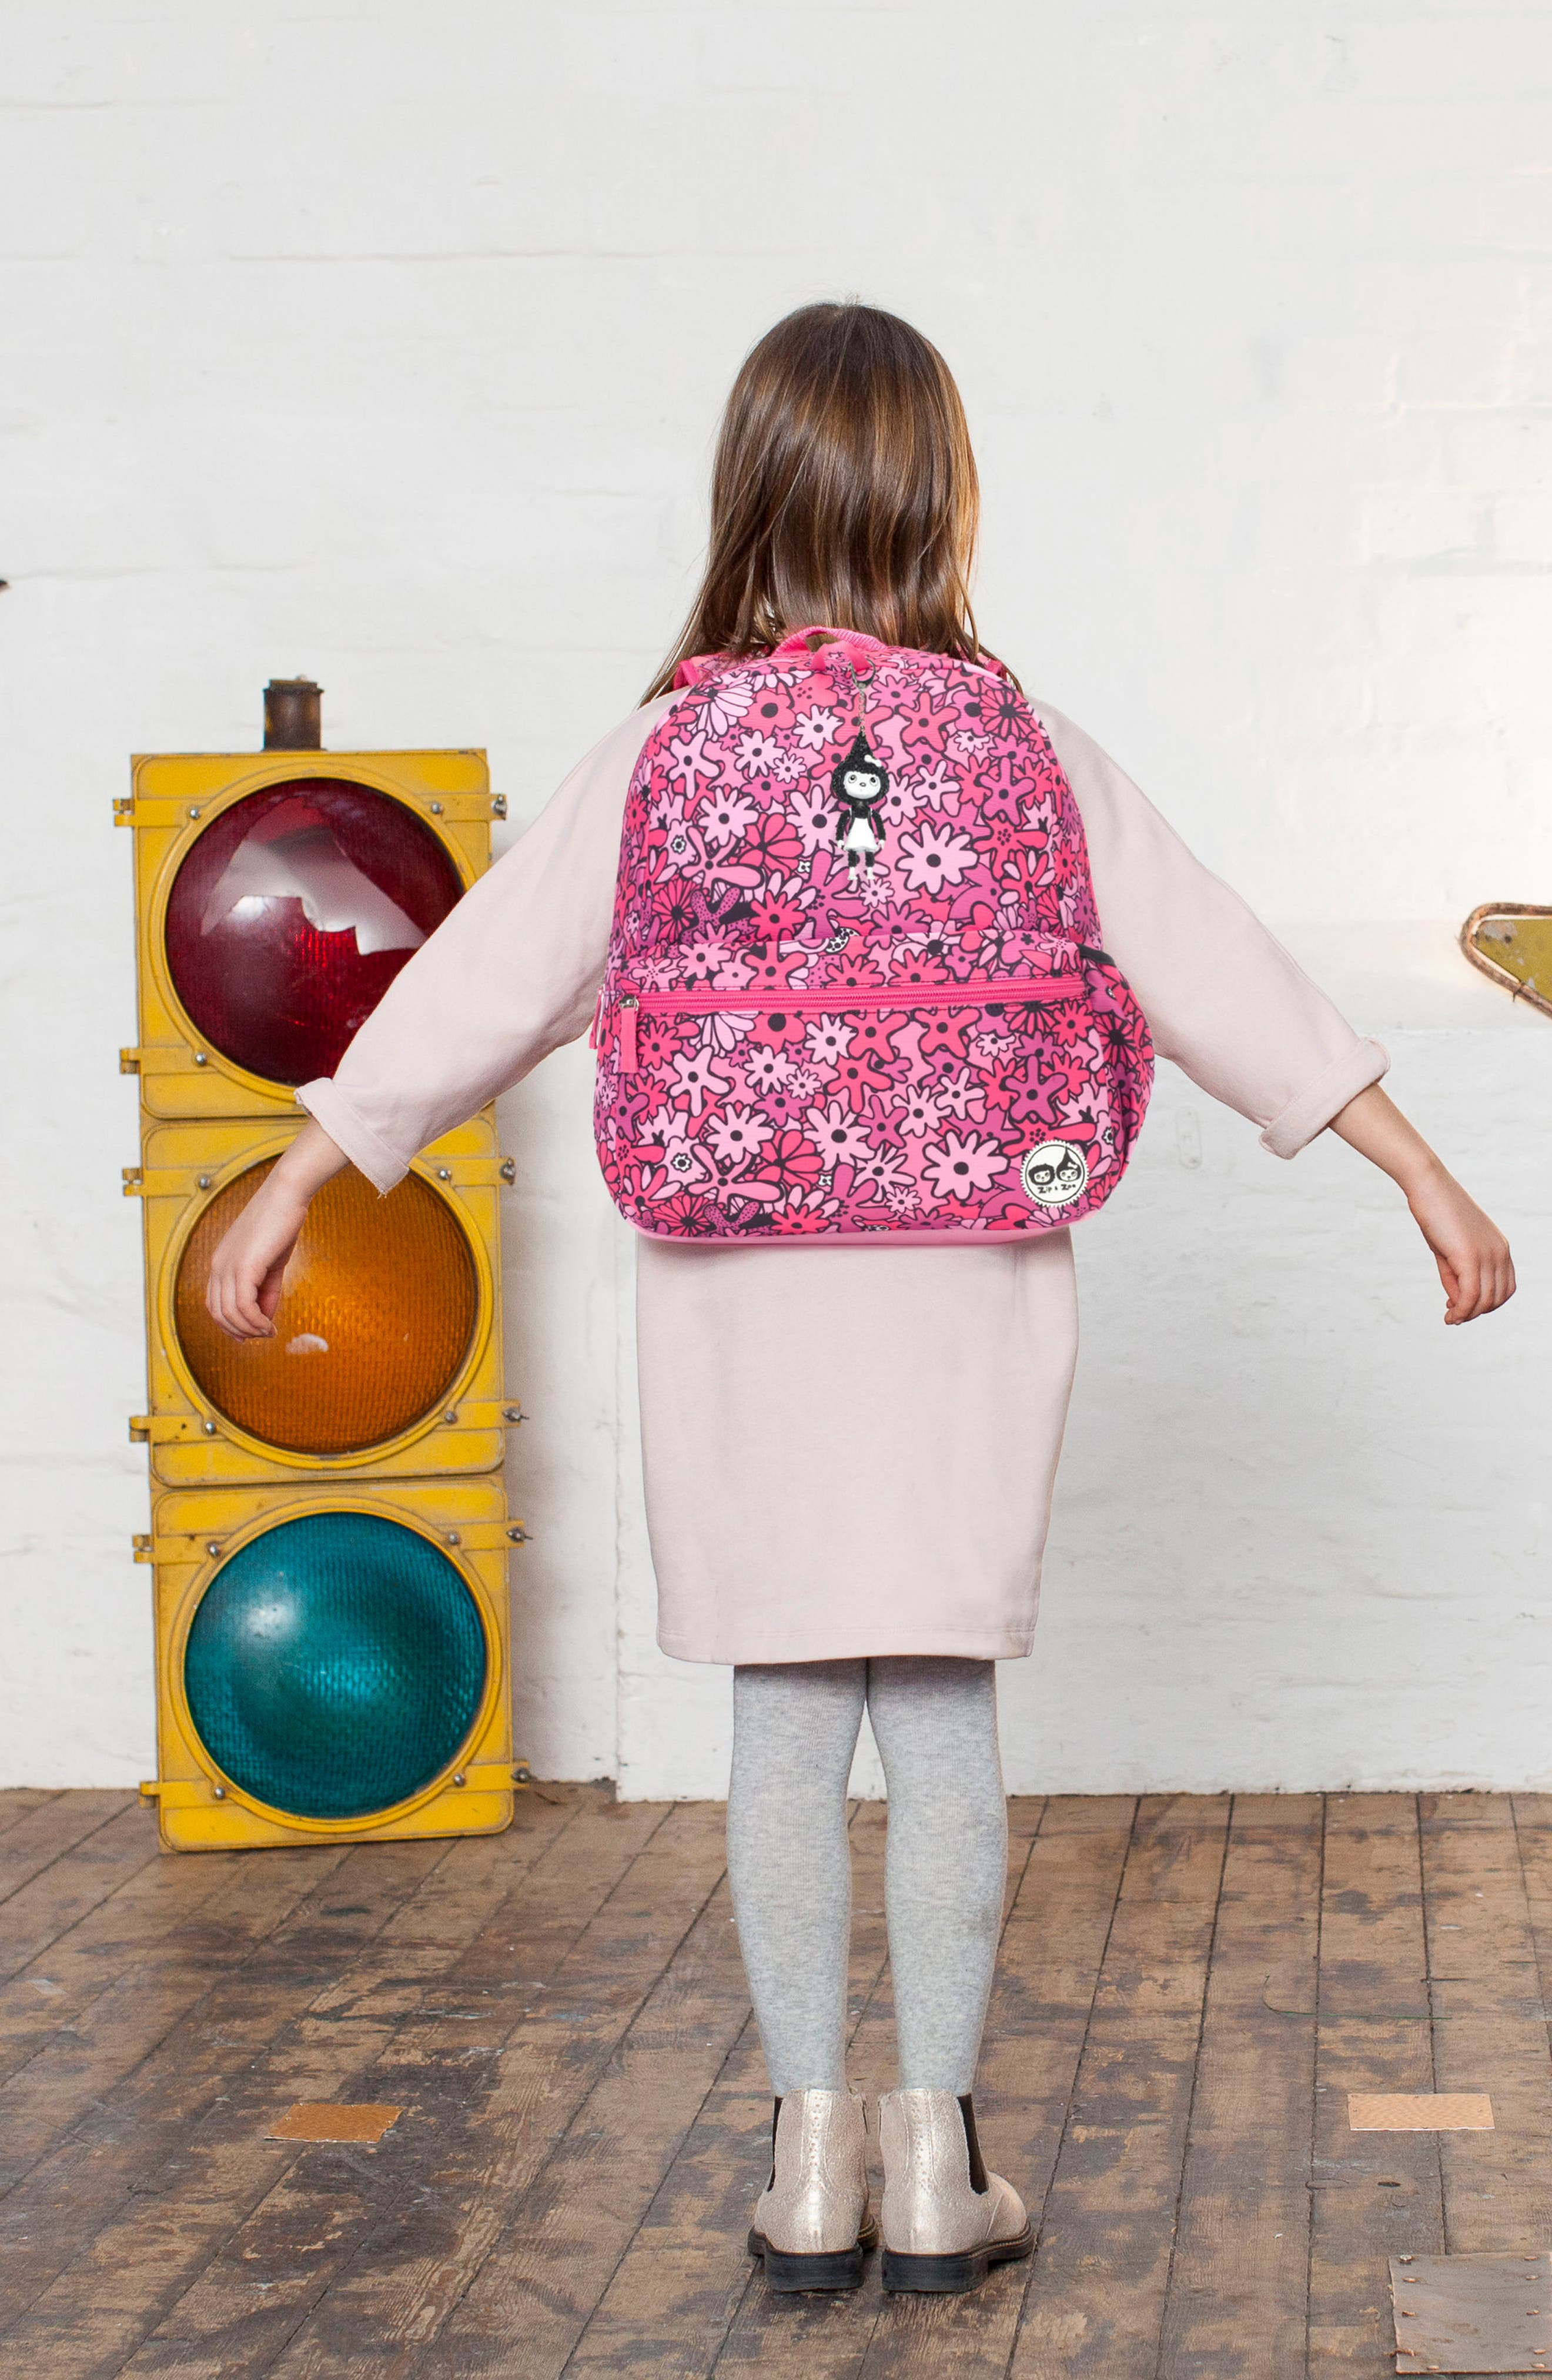 BABYMEL,                             Zip & Zoe Floral Junior Backpack,                             Alternate thumbnail 10, color,                             650